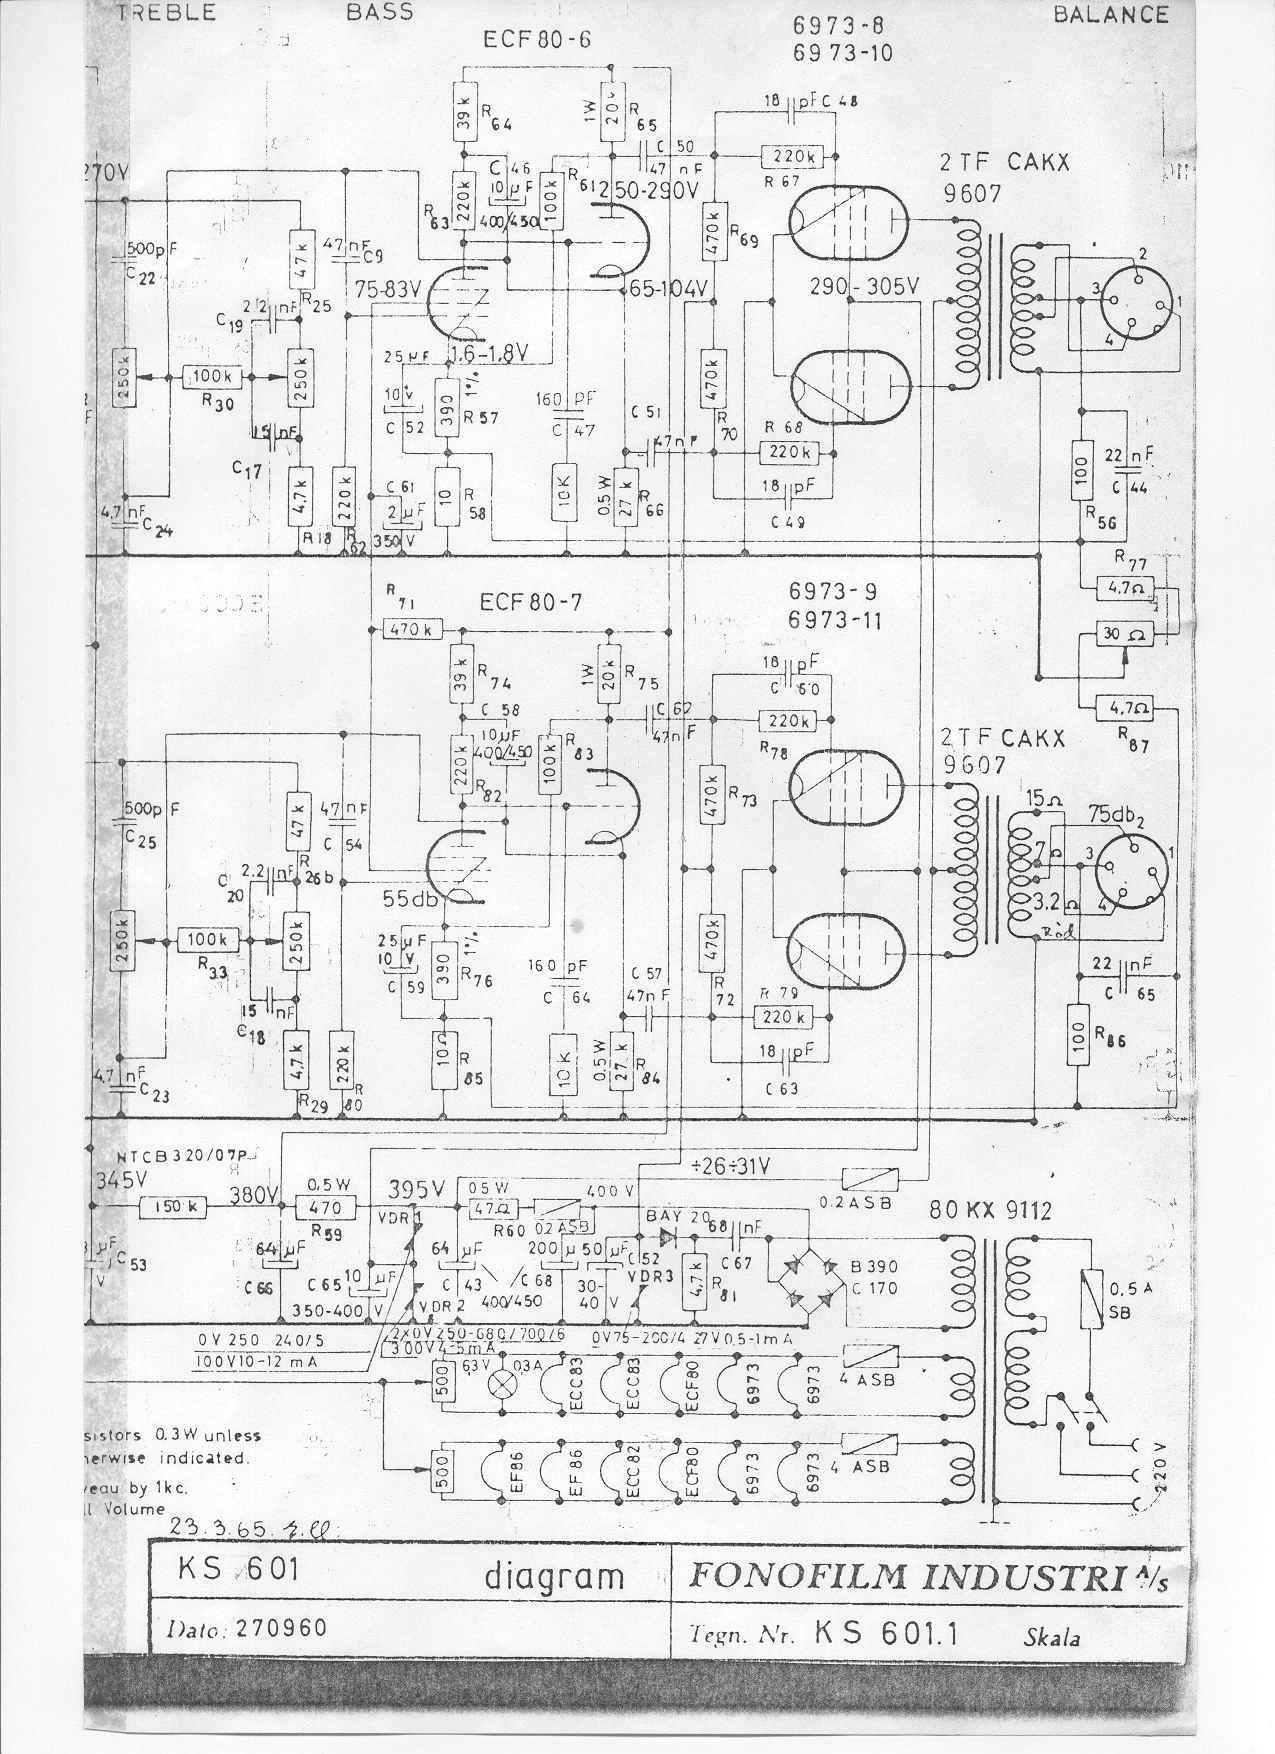 Balanced Scorecard Essay Ksxl Schematic  Stereo Valve Amplifier Federalists Essays also Argument Essay Template Ortofon Cutterhead Service And Repair Bass Limiter For Protection  Essay Warehouse